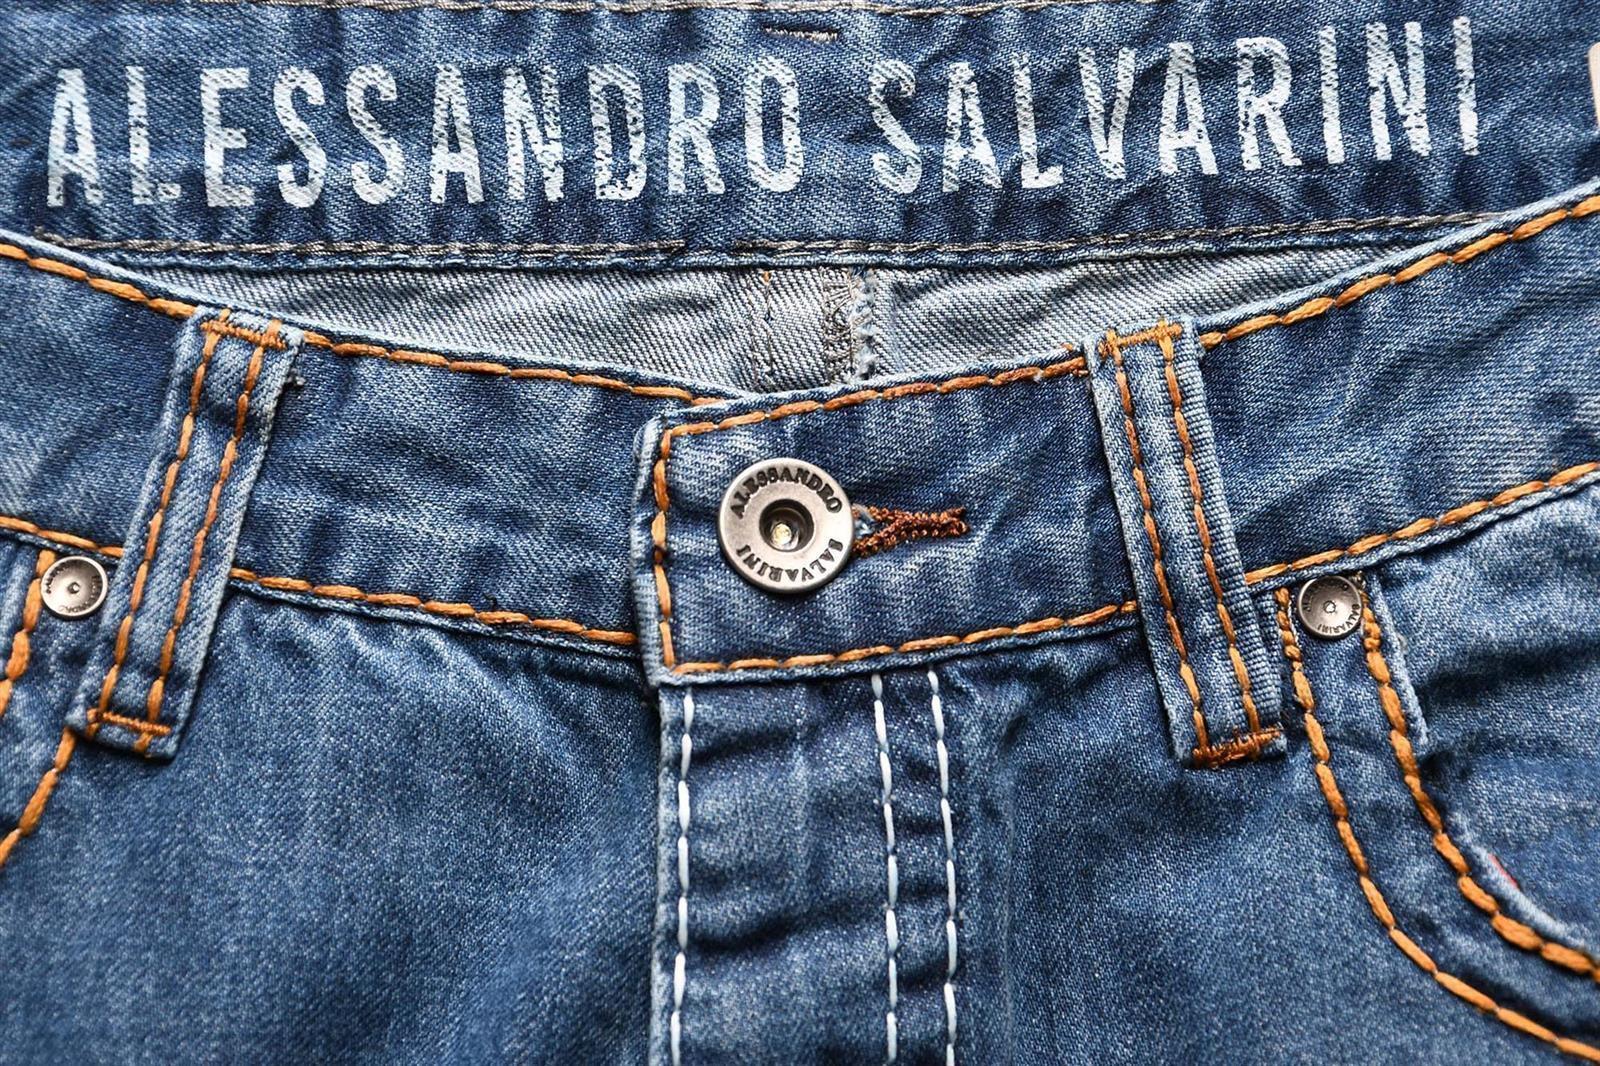 A-Salvarini-Herren-Jeans-Hose-dicke-Naehte-Jeanshose-Comfort-Fit-gerades-Bein Indexbild 15